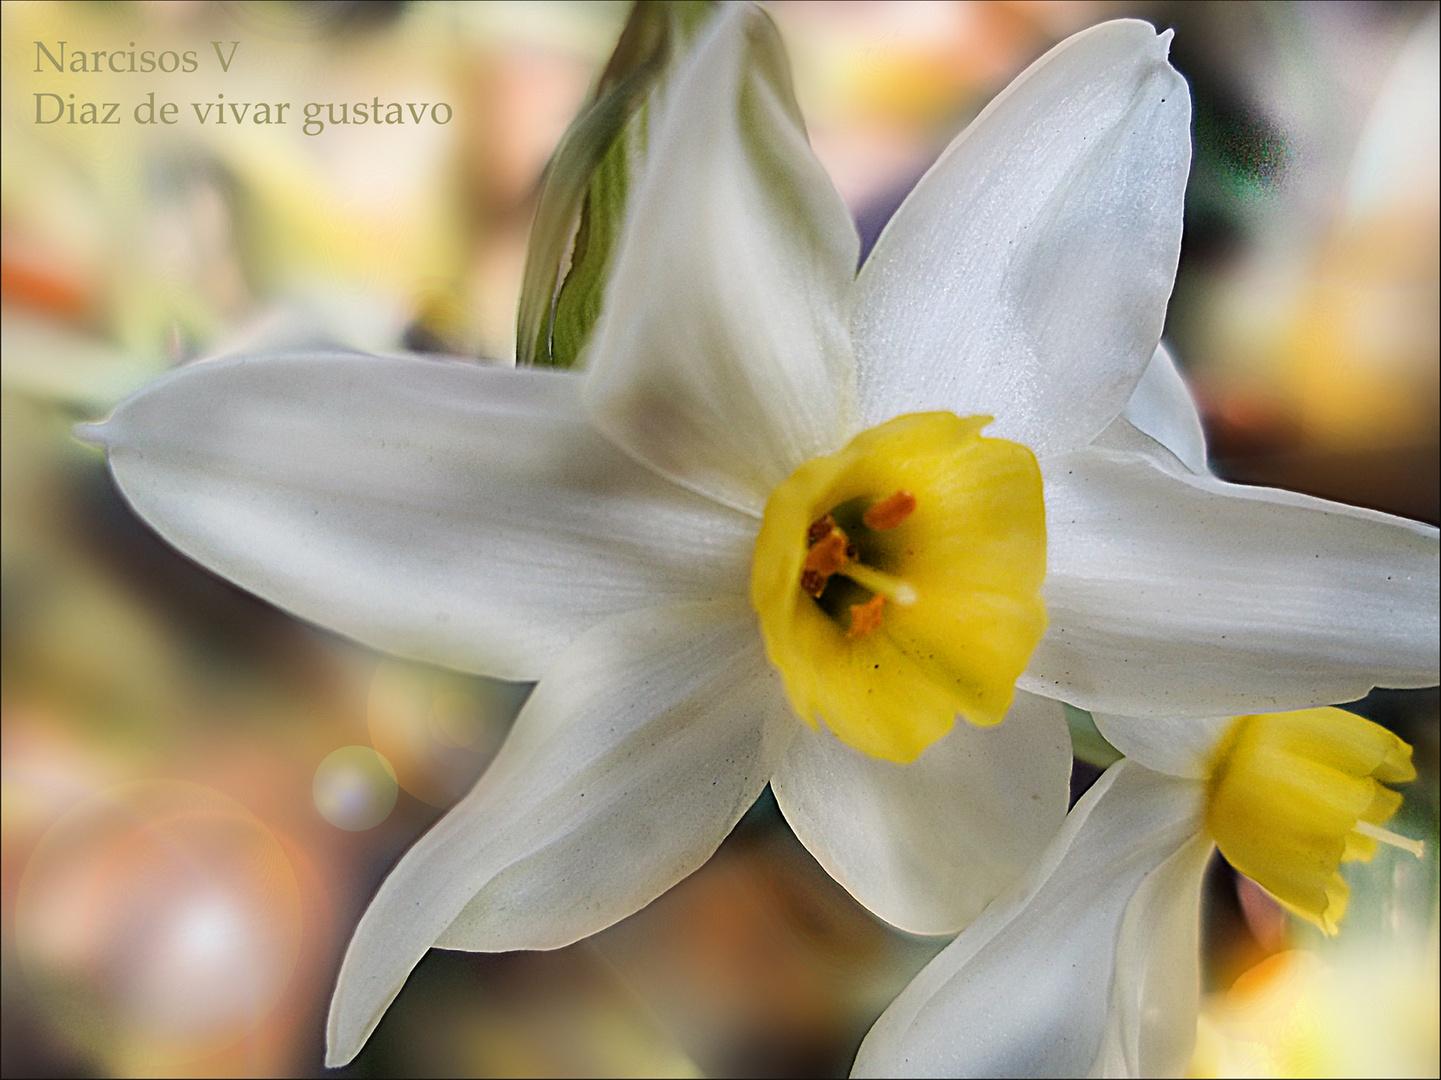 Narcisos V - Diaz de vivar gustavo